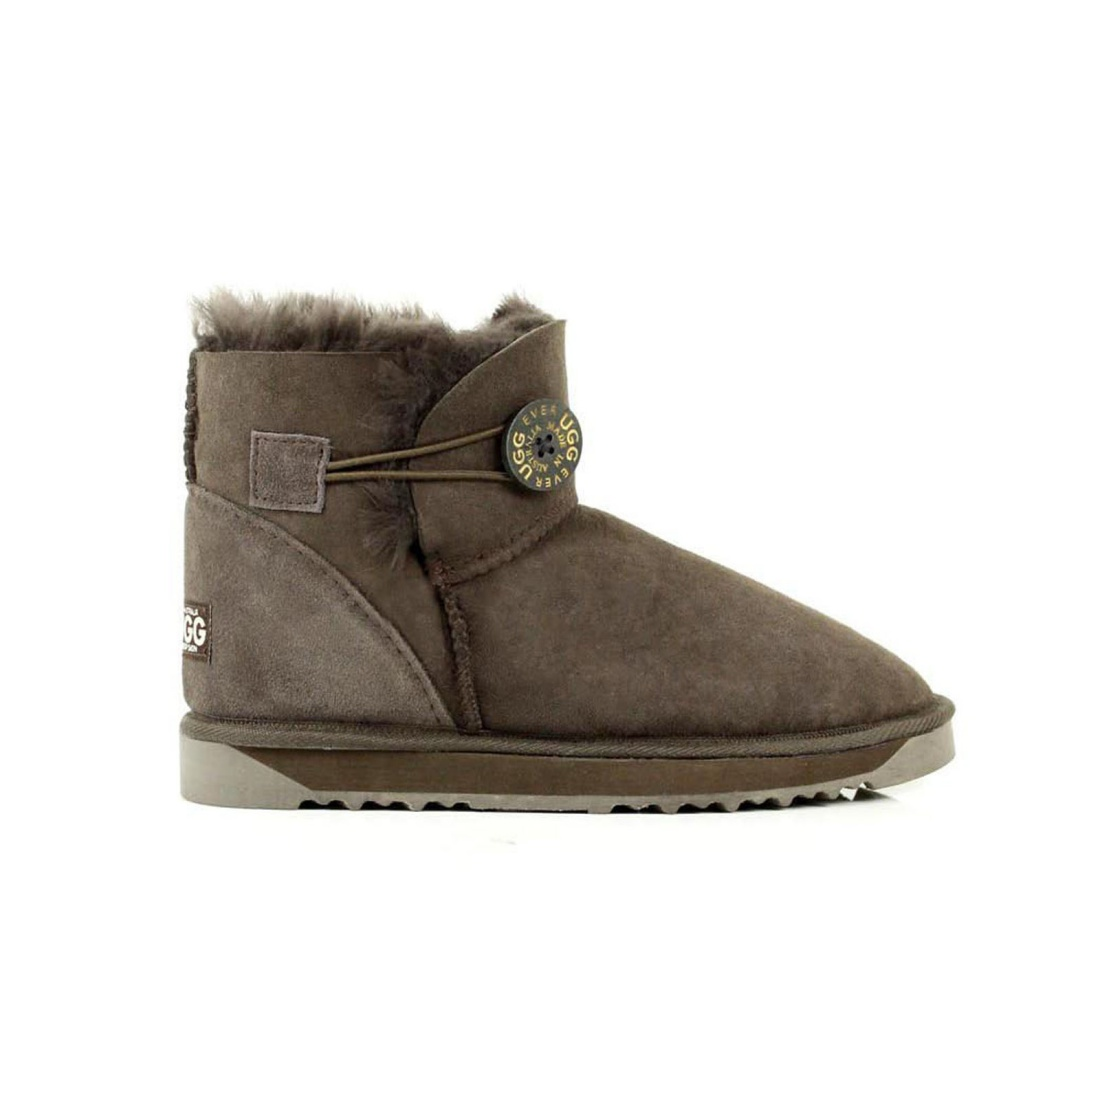 UGG Button Ankle Boots Mini - Chocolate - AU Women 6 / Men 4